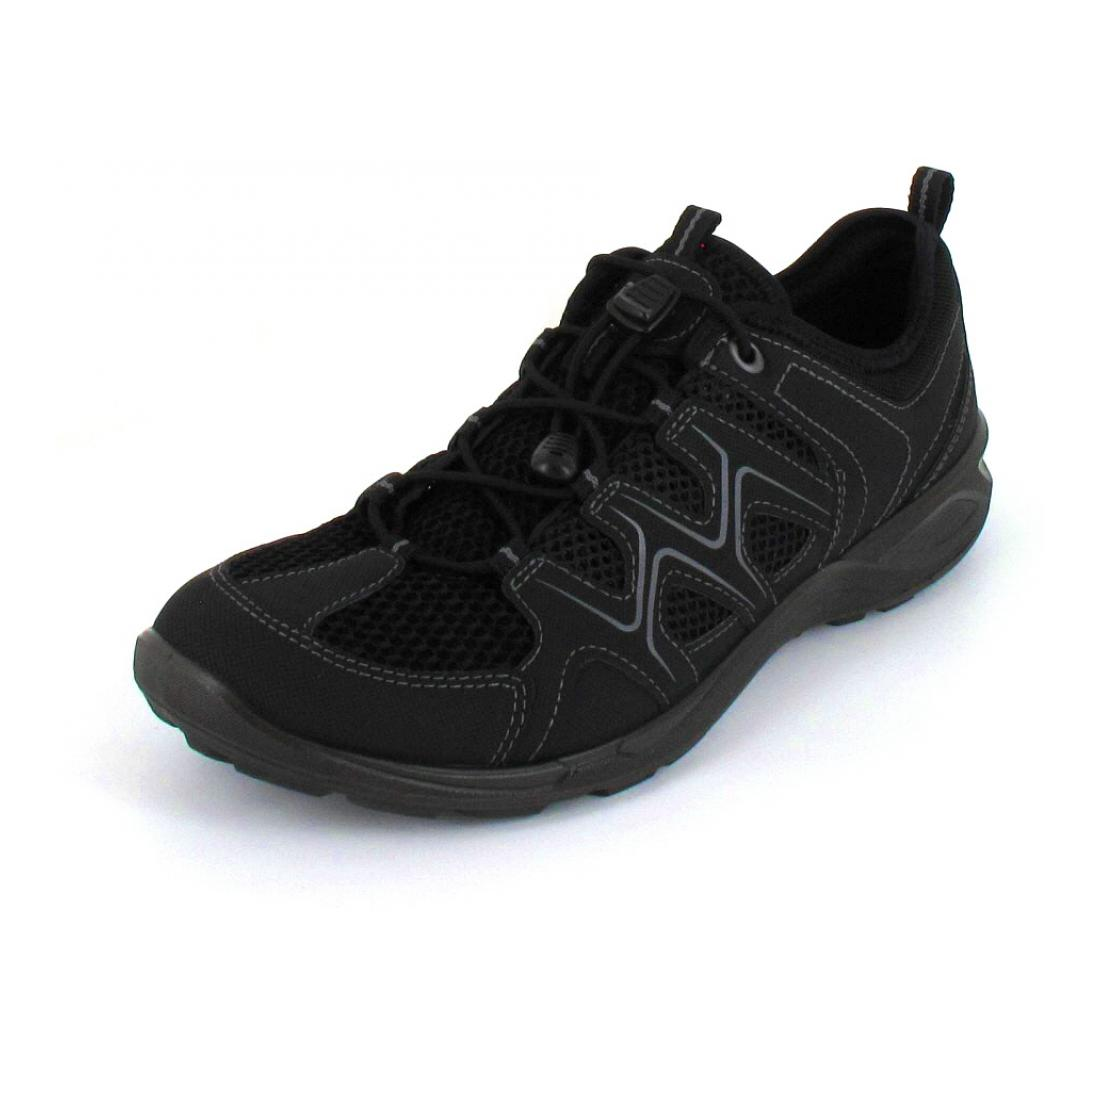 Ecco Sandale Terracruise LT W